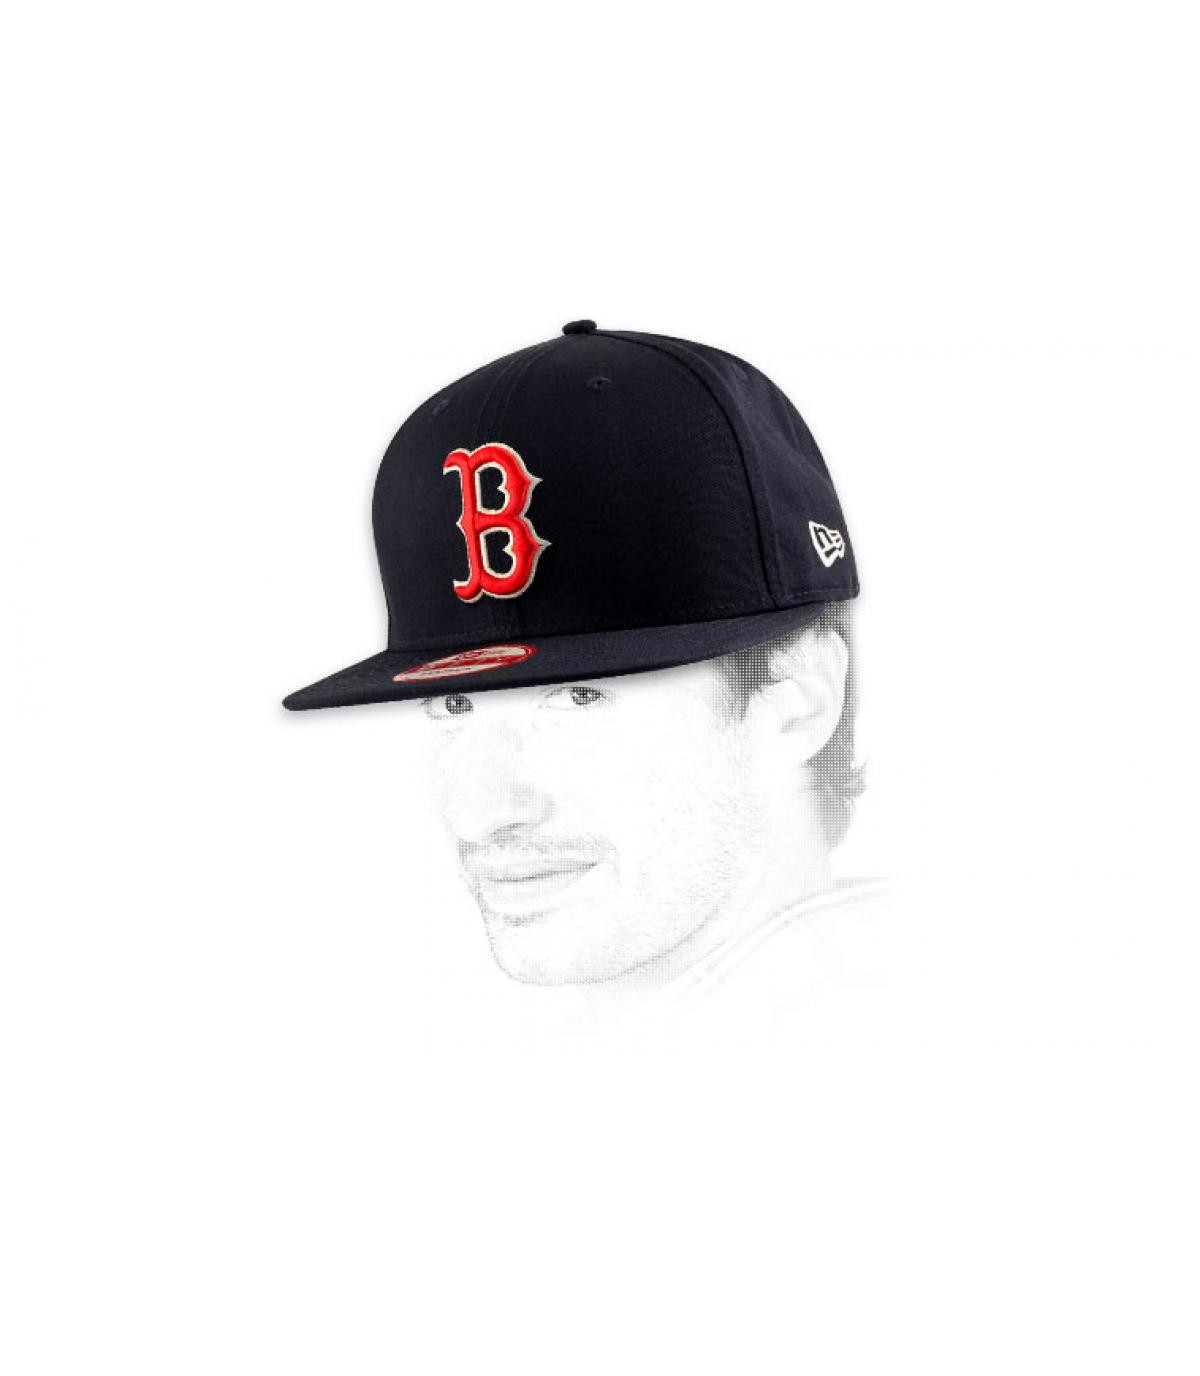 Details Snapback Boston team - Abbildung 7